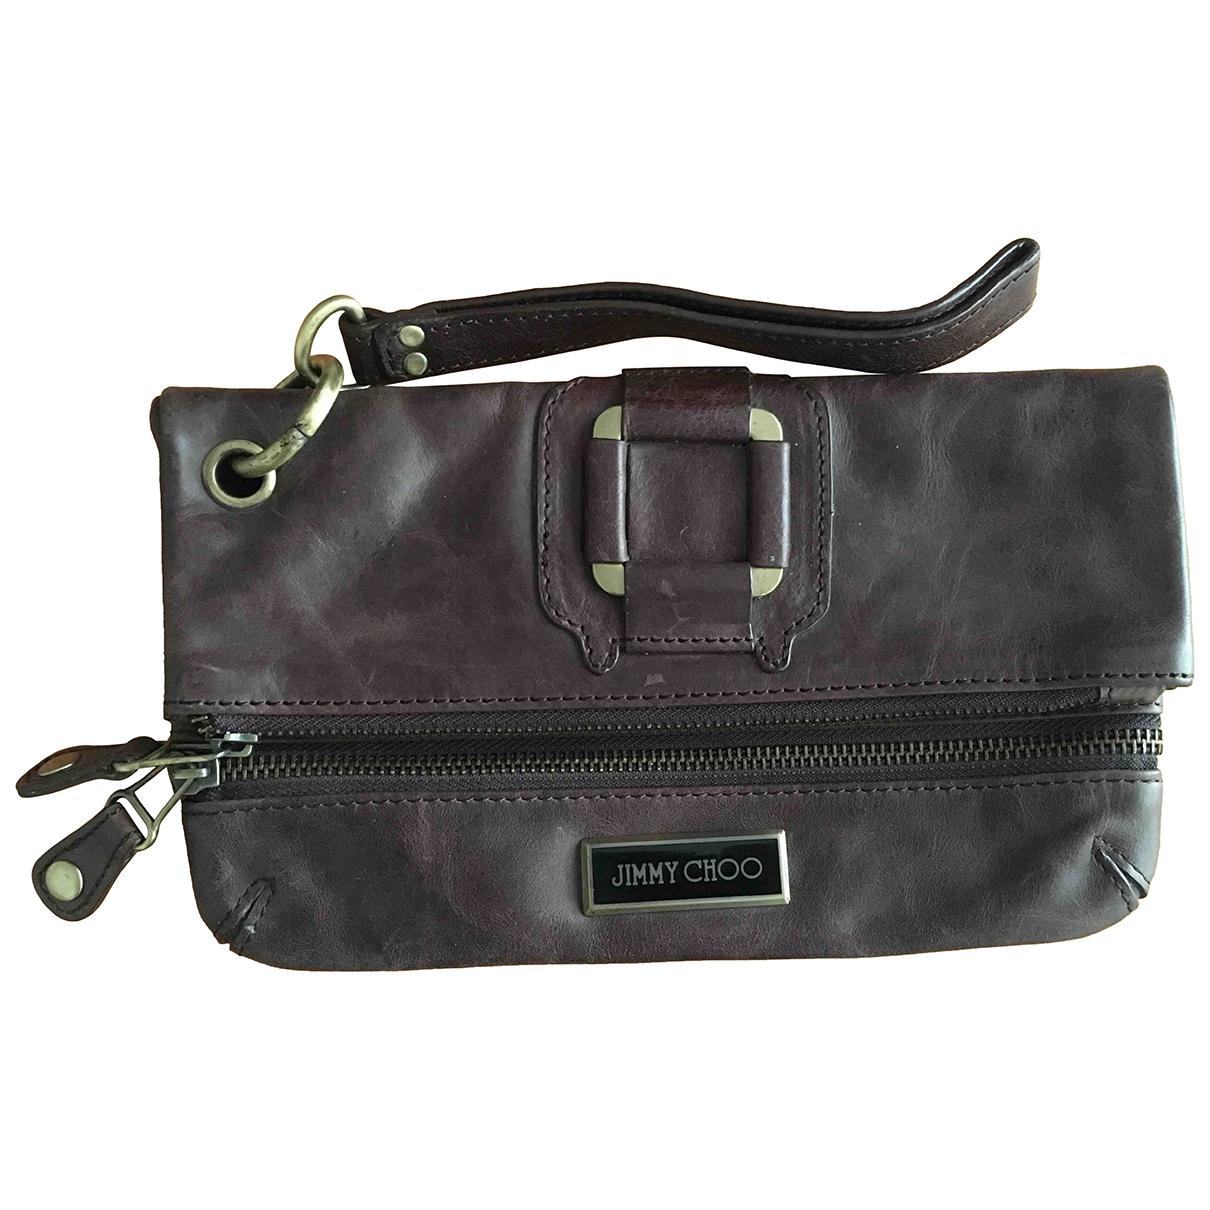 Jimmy Choo \N Brown Leather Clutch bag for Women \N